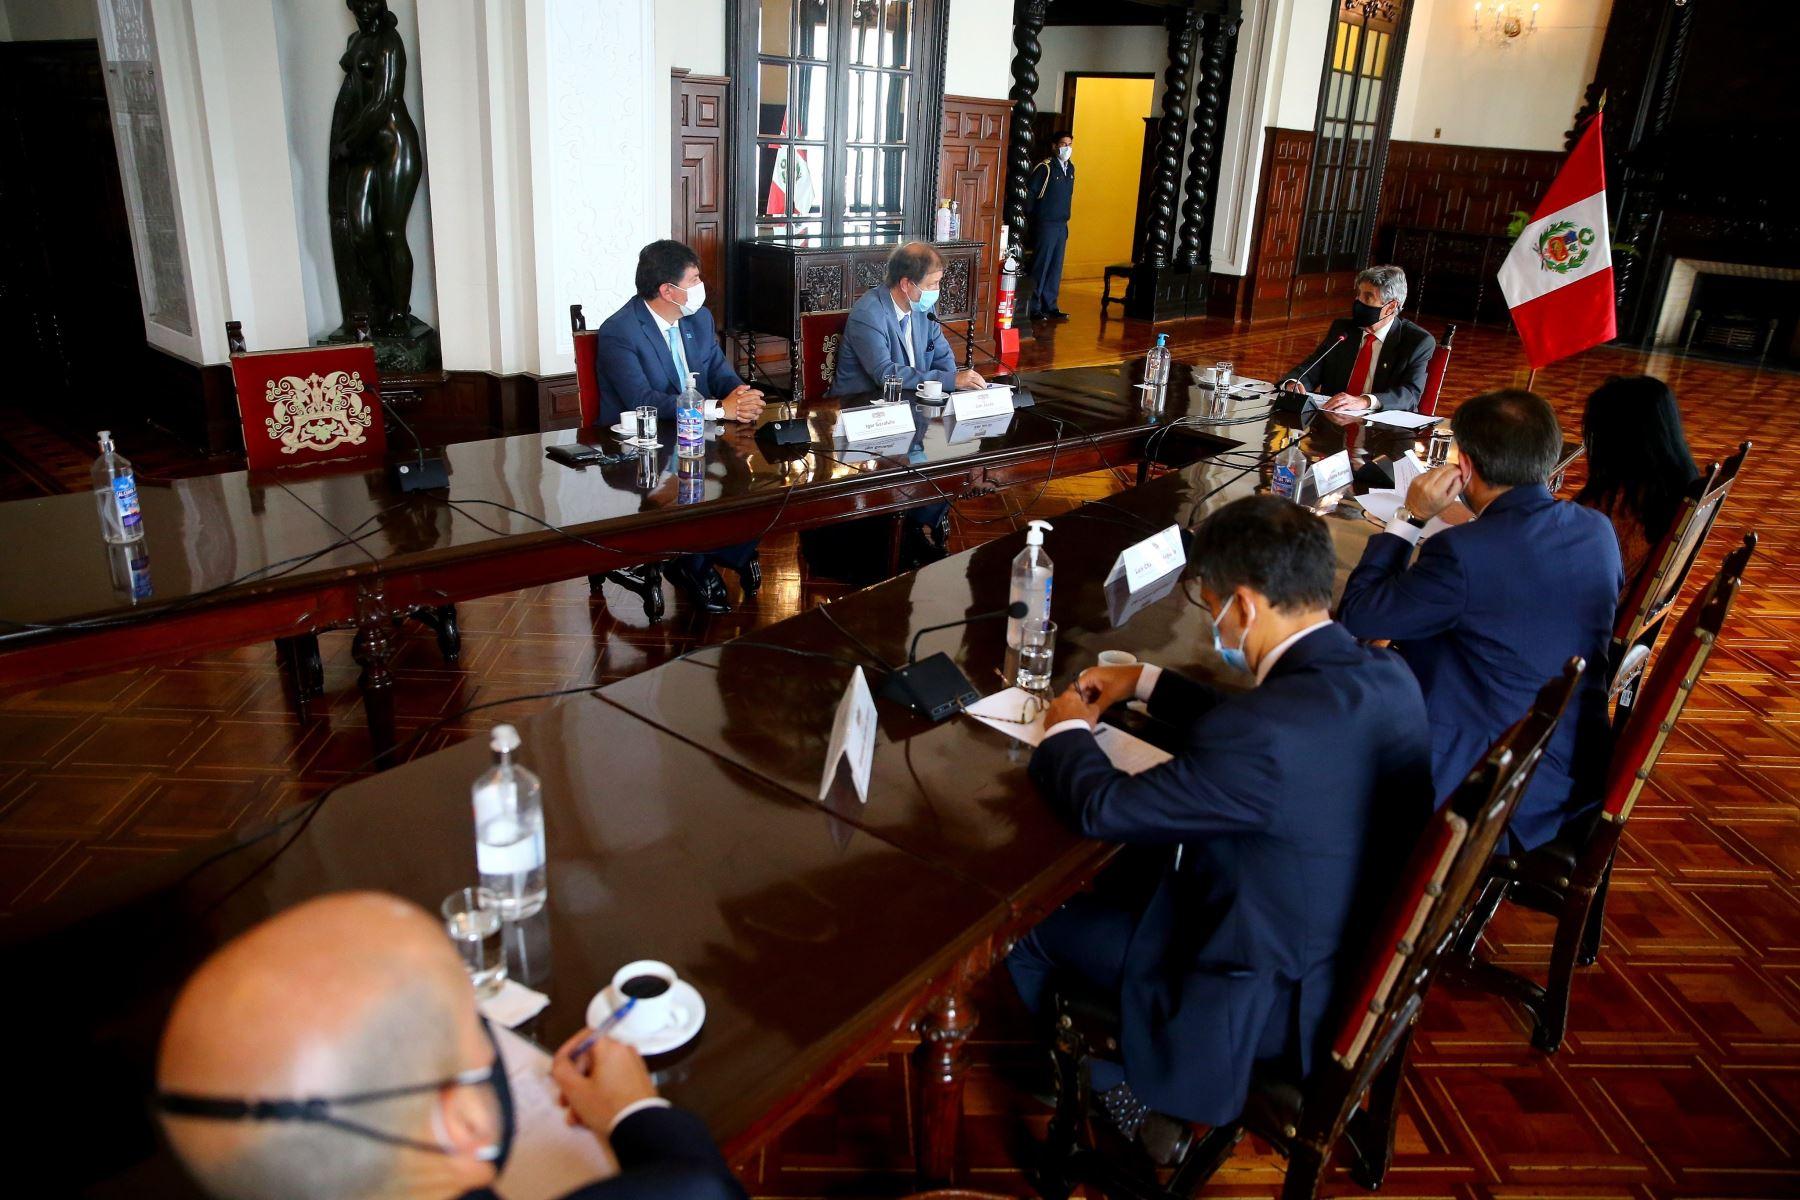 Photo: Twitter/United Nations in Peru